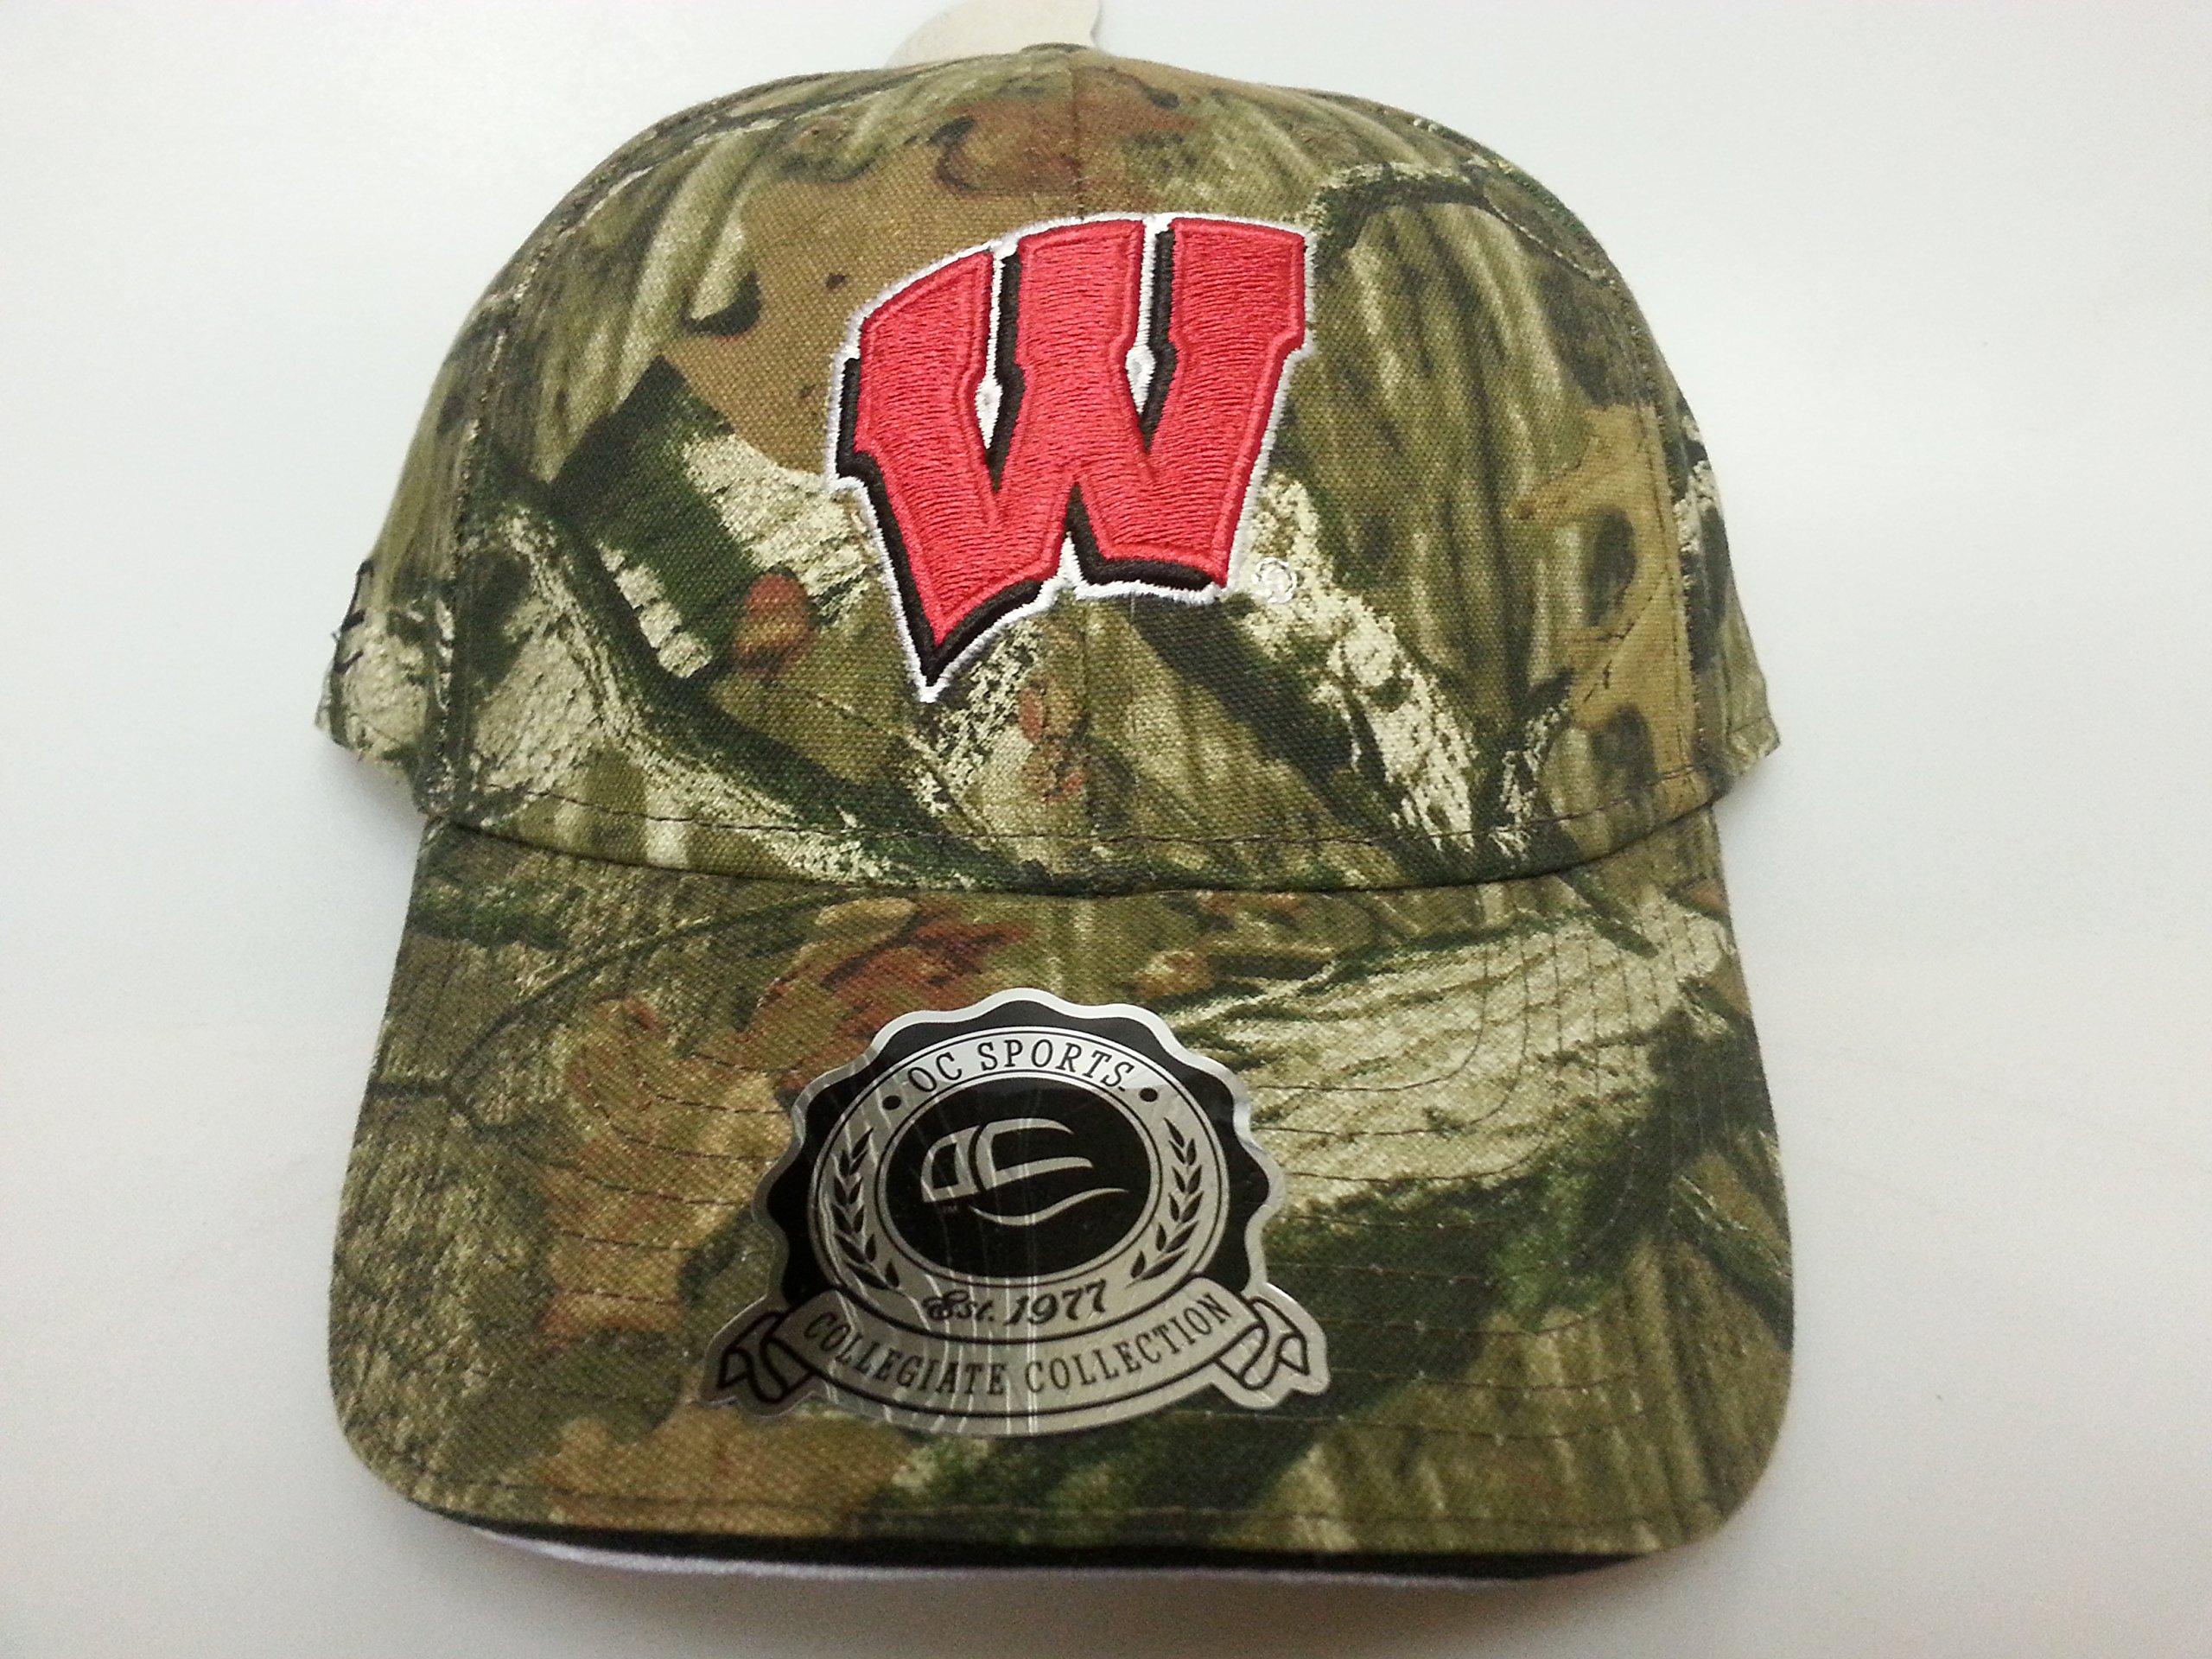 NCAA New Wisconsin Badgers Realtree Camo Buckle Hat